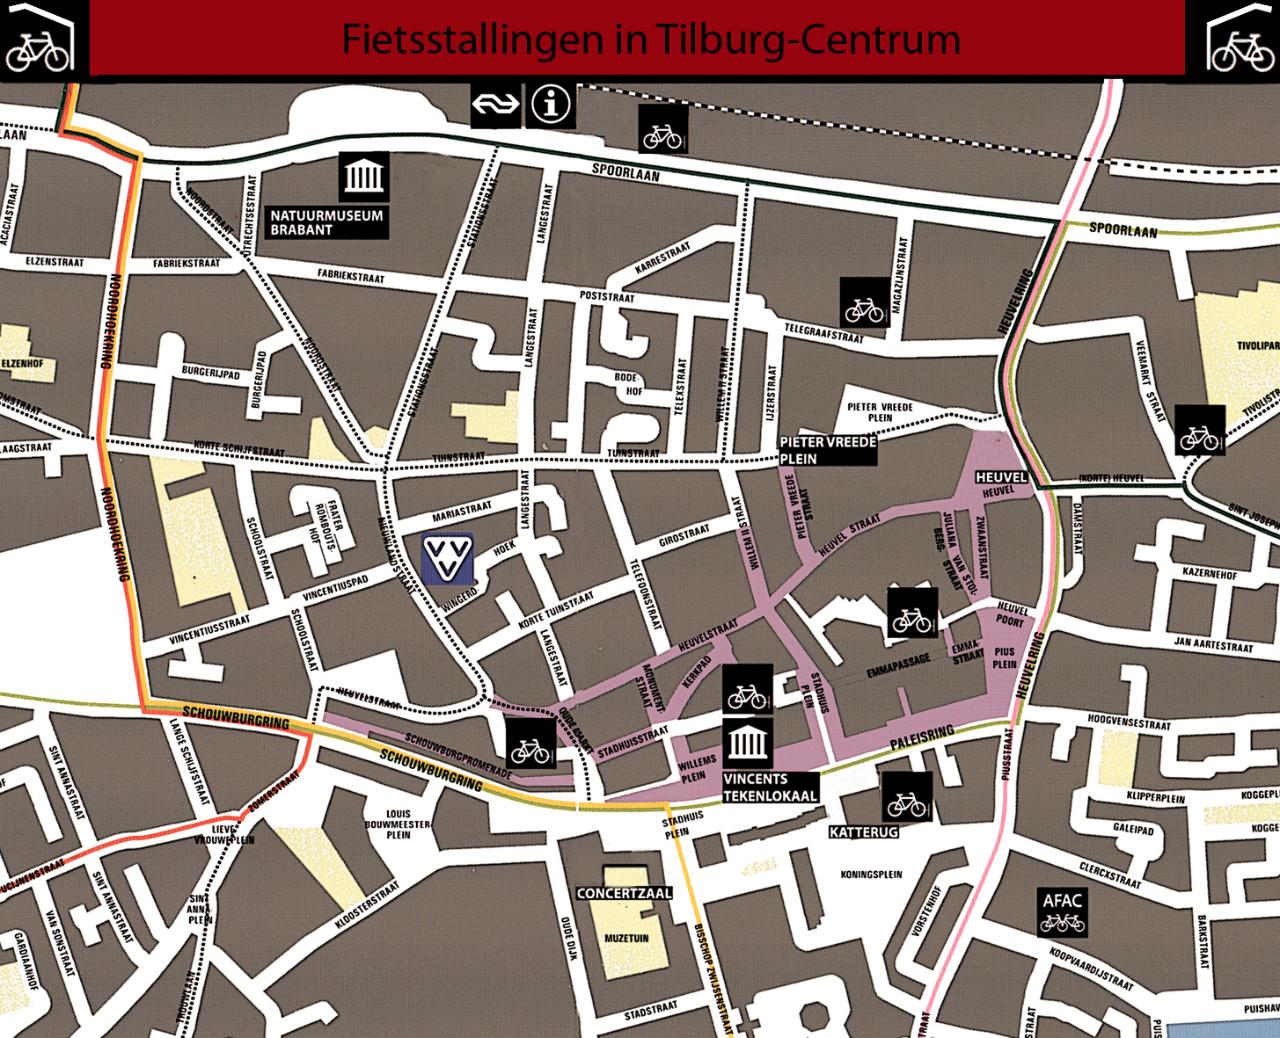 centrum tilburg plattegrond